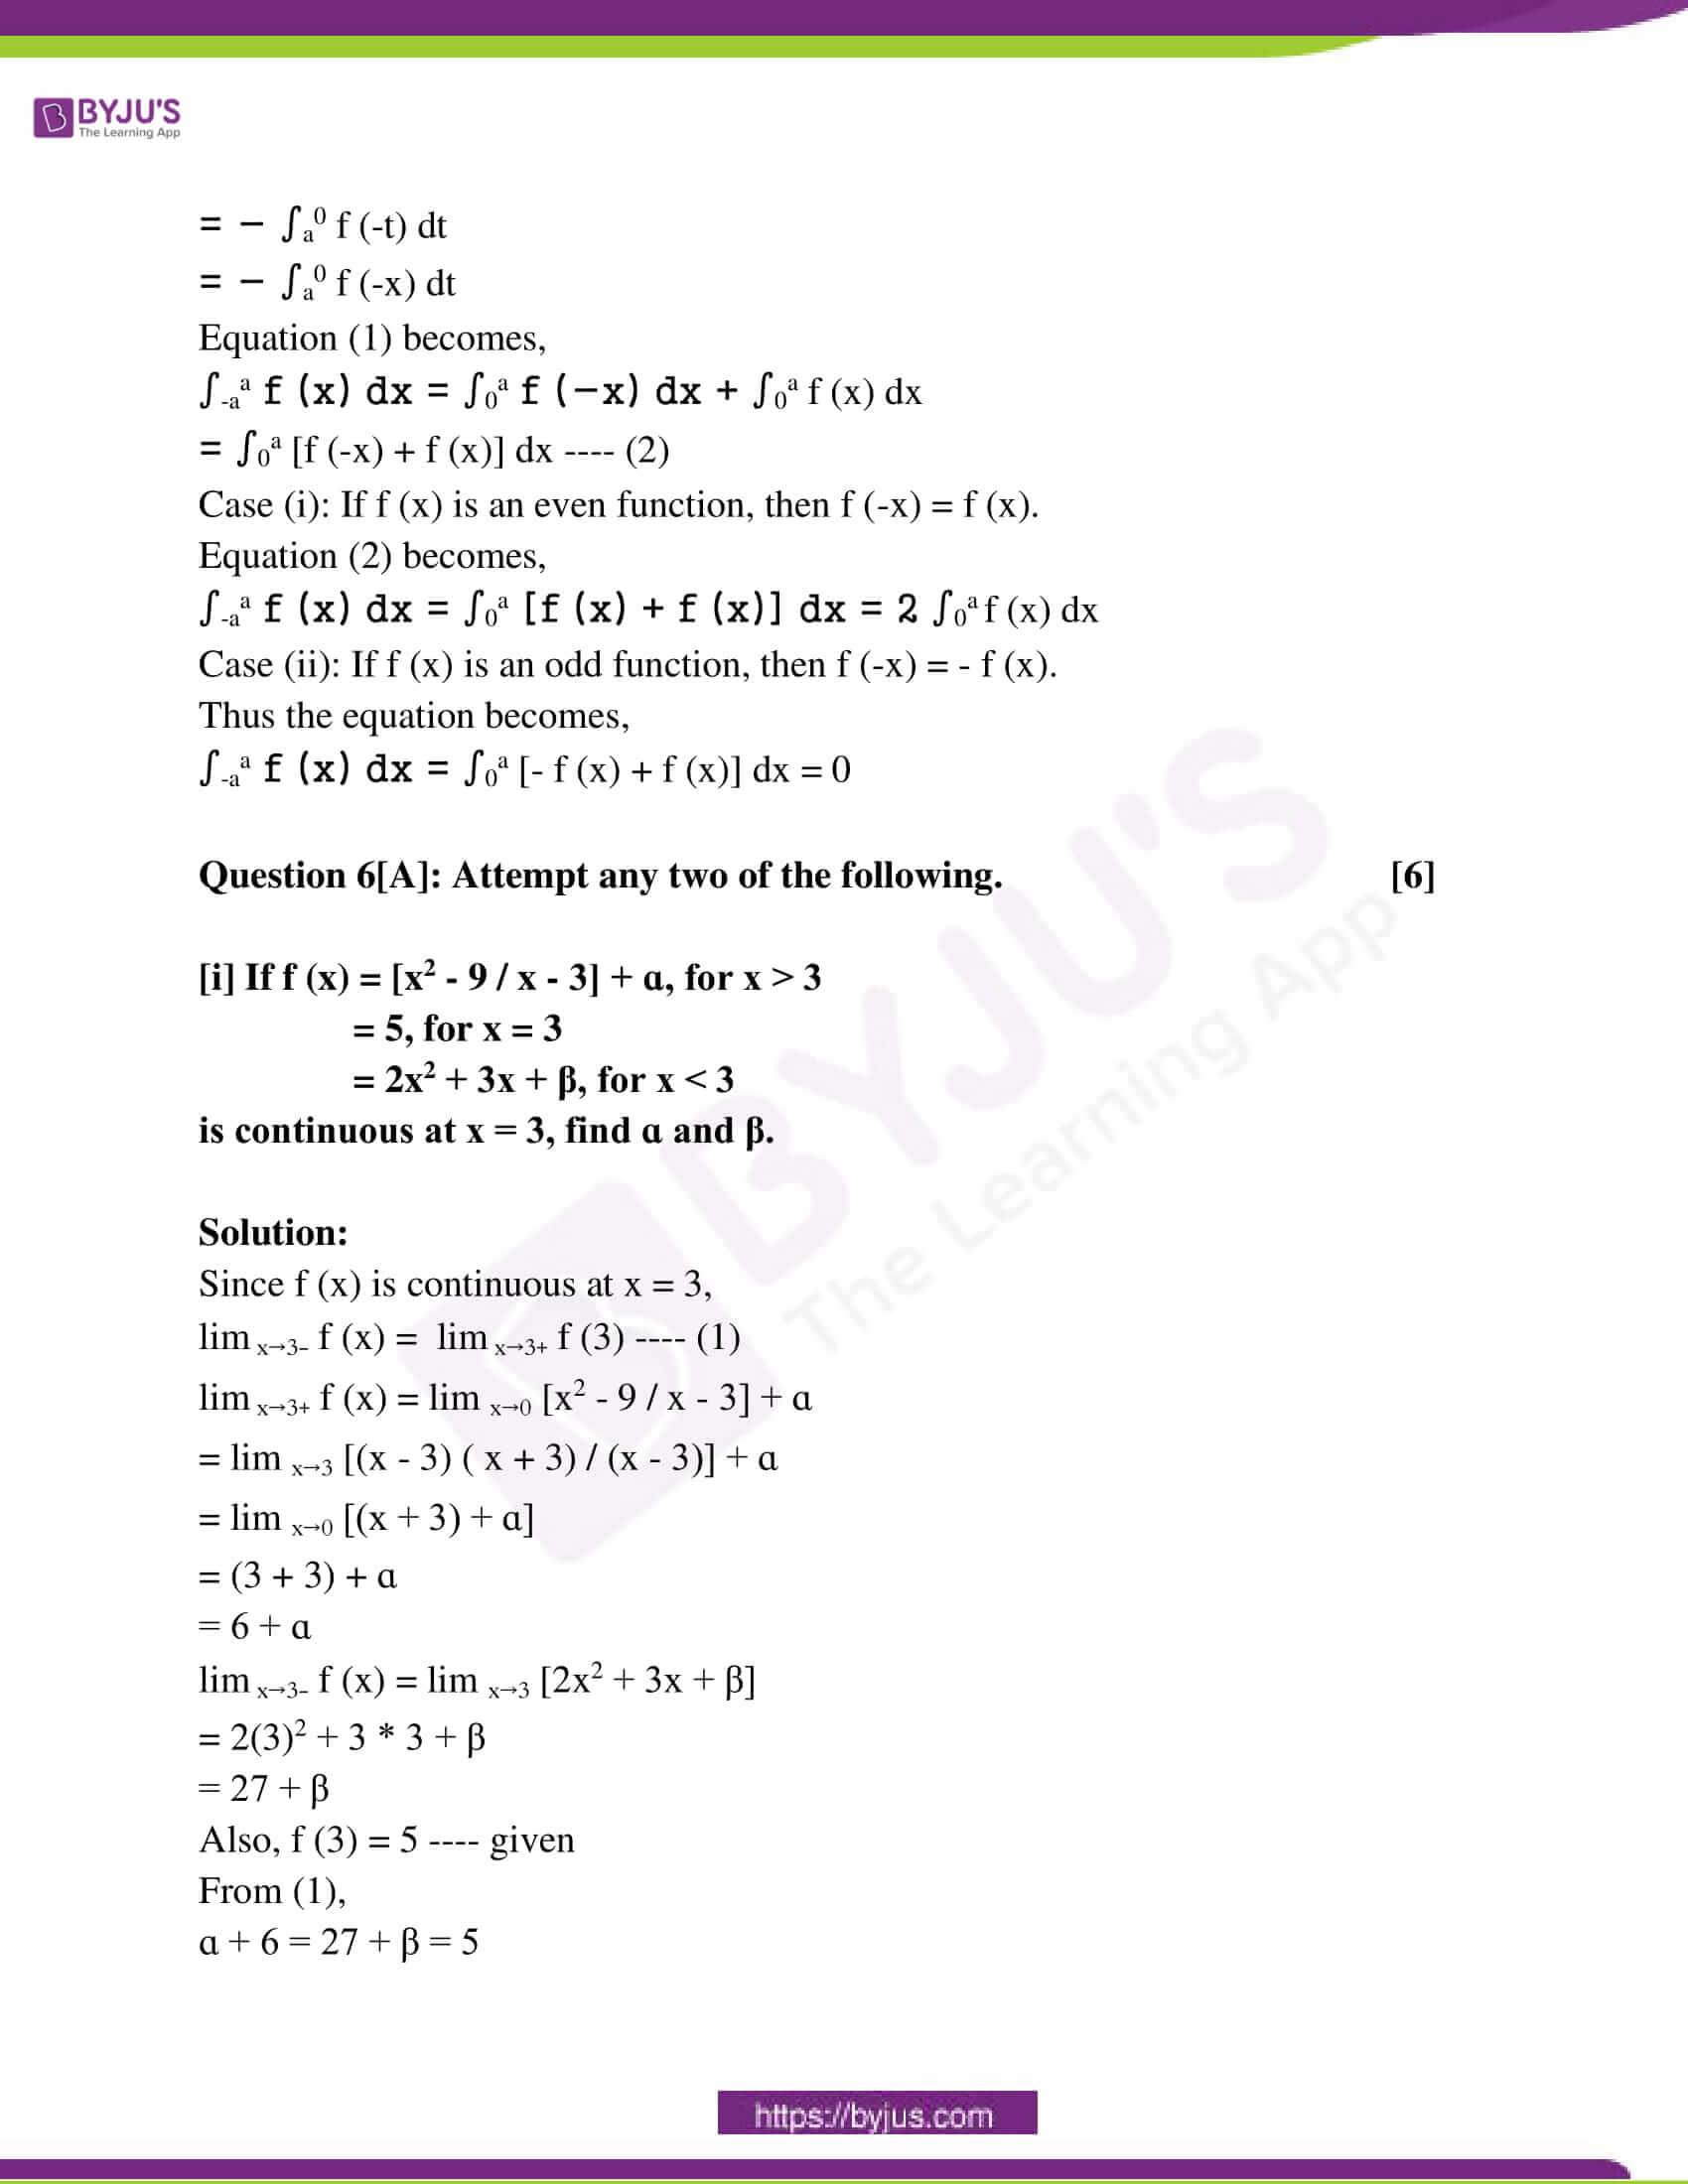 maharashtra class 12 exam question paper solutions march 2018 20